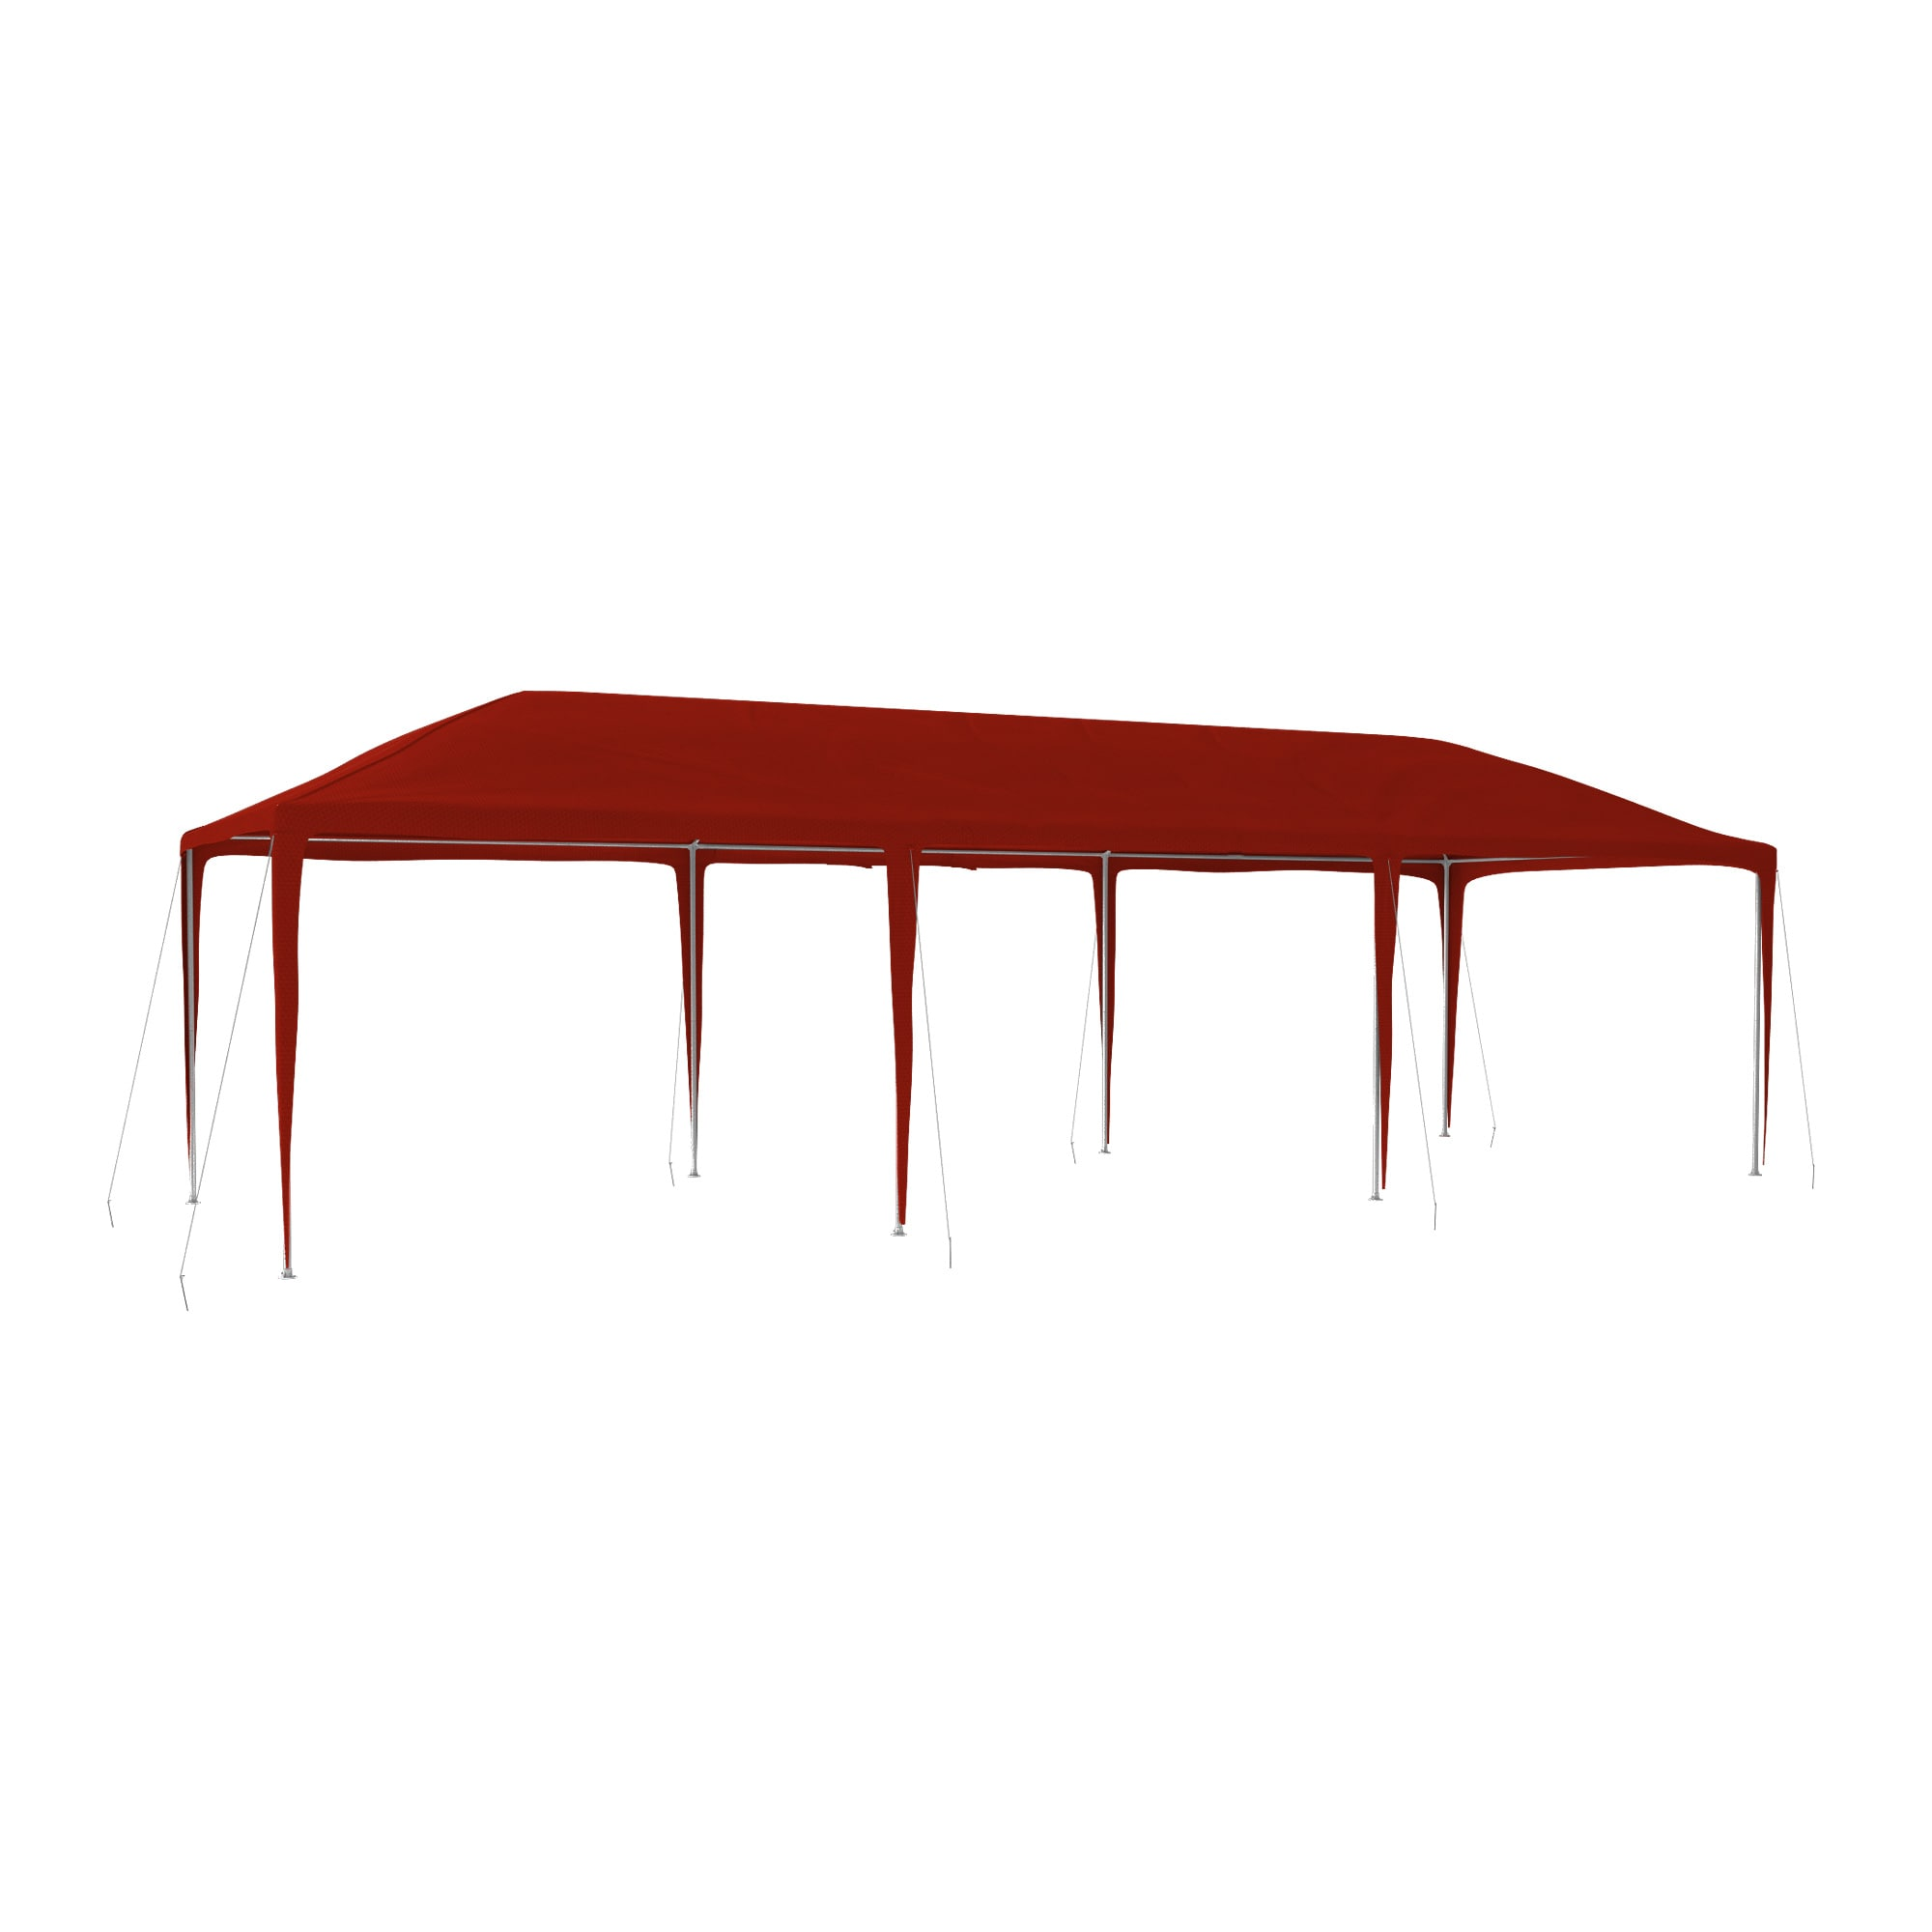 pe pavillon 3x3 3x6 3x9 wasserdicht rot festzelt partyzelt gartenpavillon zelt ebay. Black Bedroom Furniture Sets. Home Design Ideas